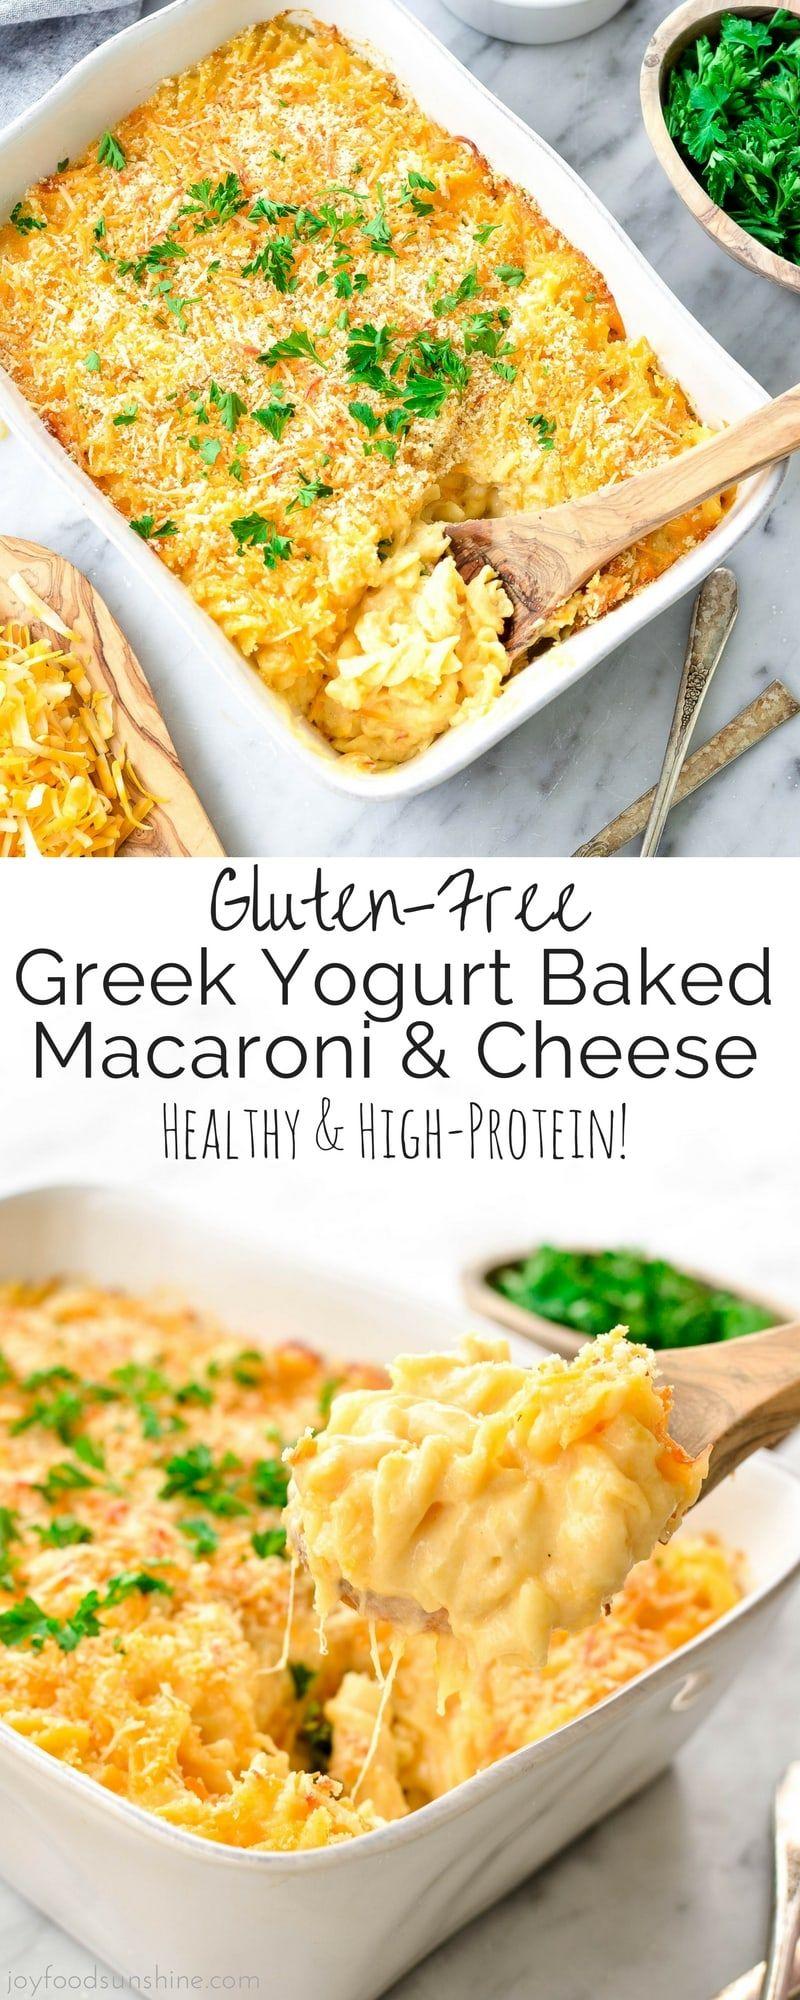 Glutenfree baked greek yogurt macaroni cheese is an